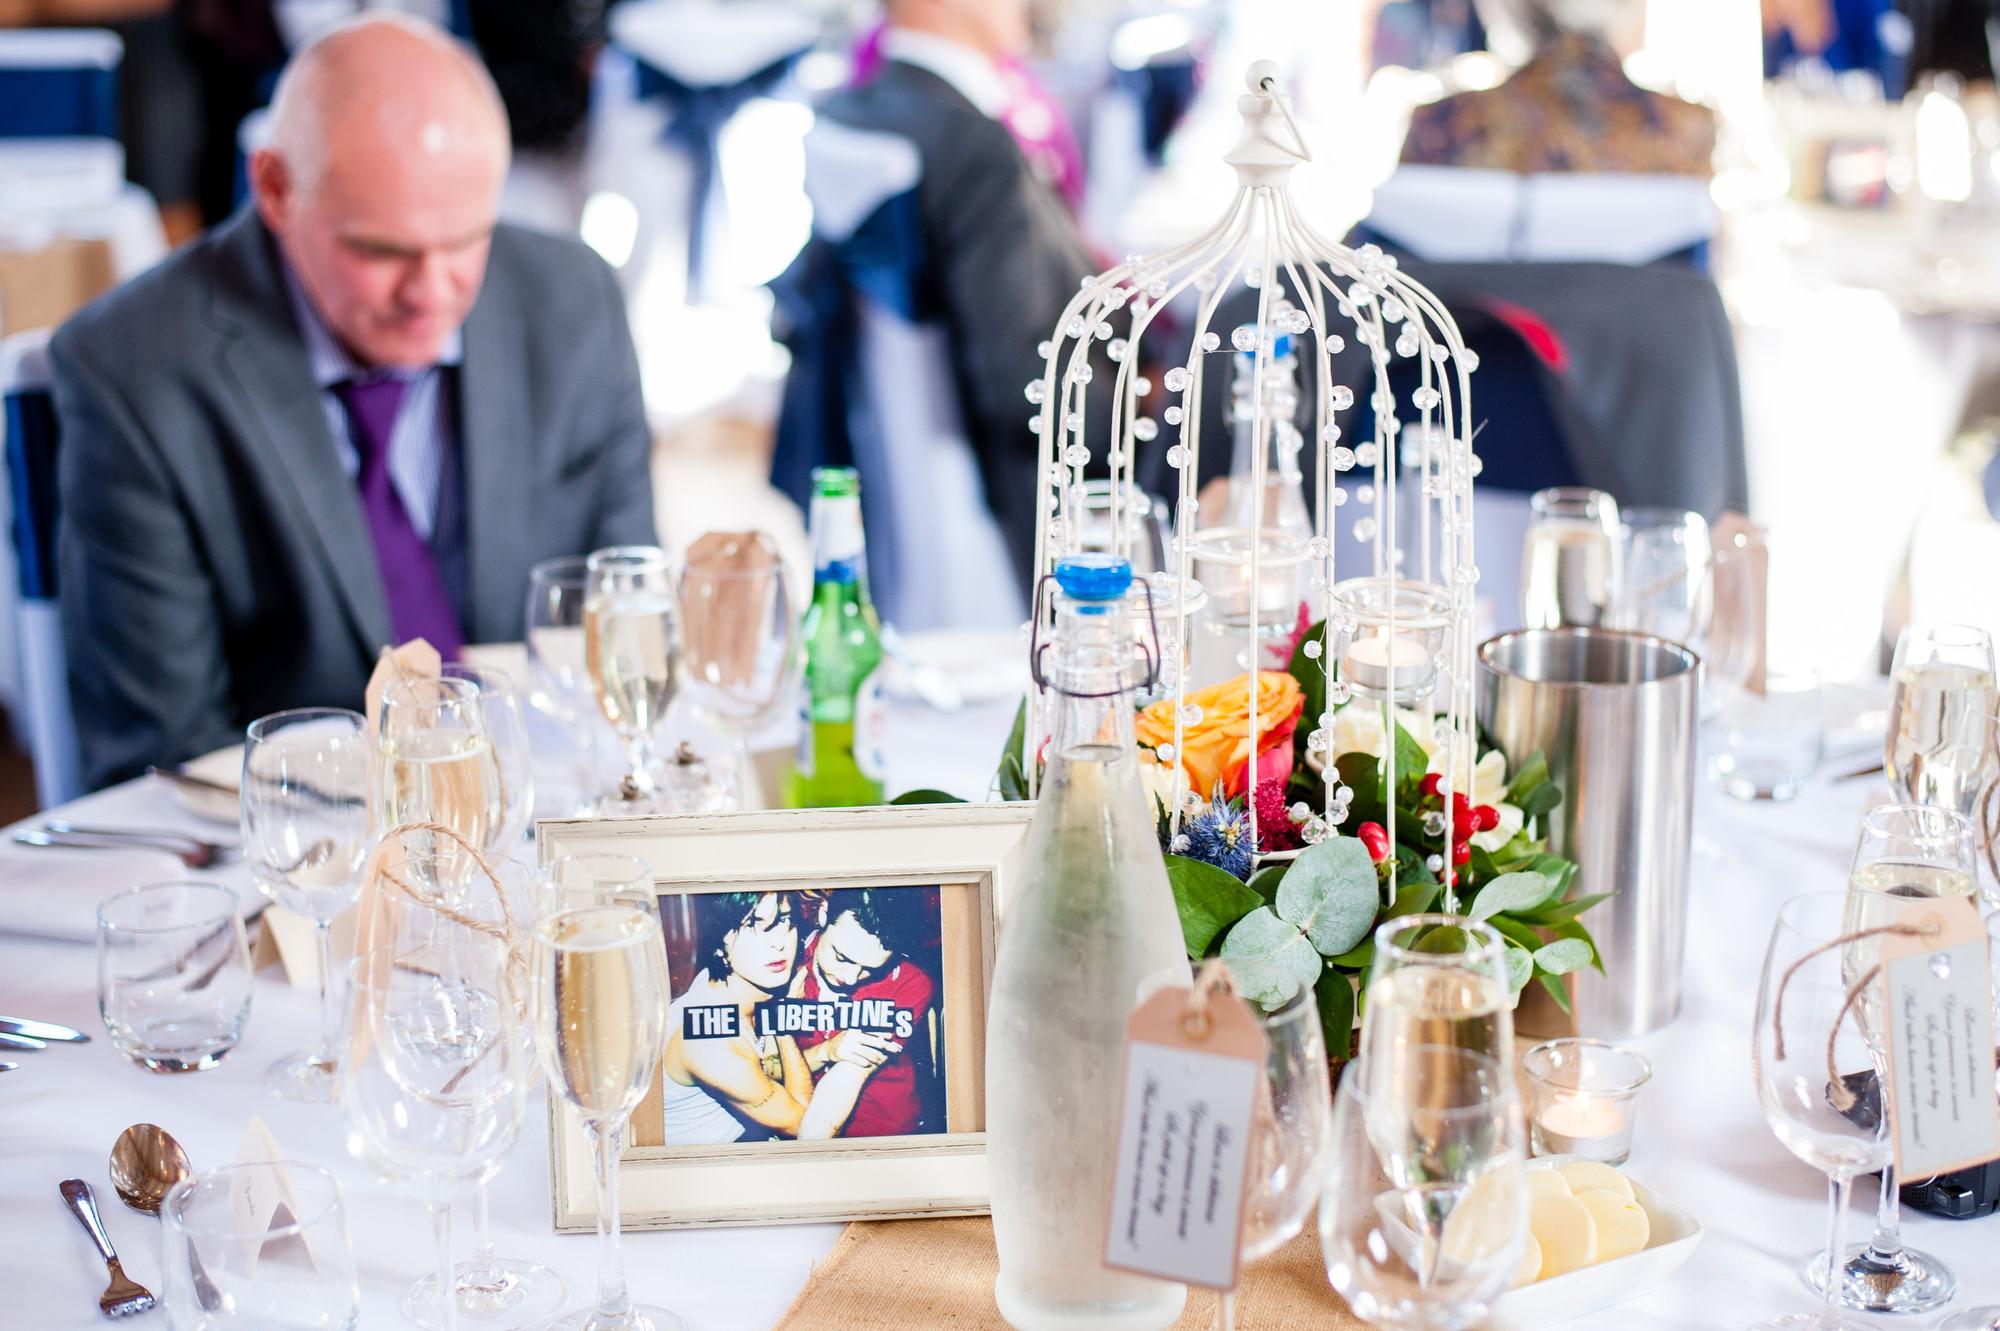 Geoff-Kirby-photography-Carriage-Hall-wedding0091